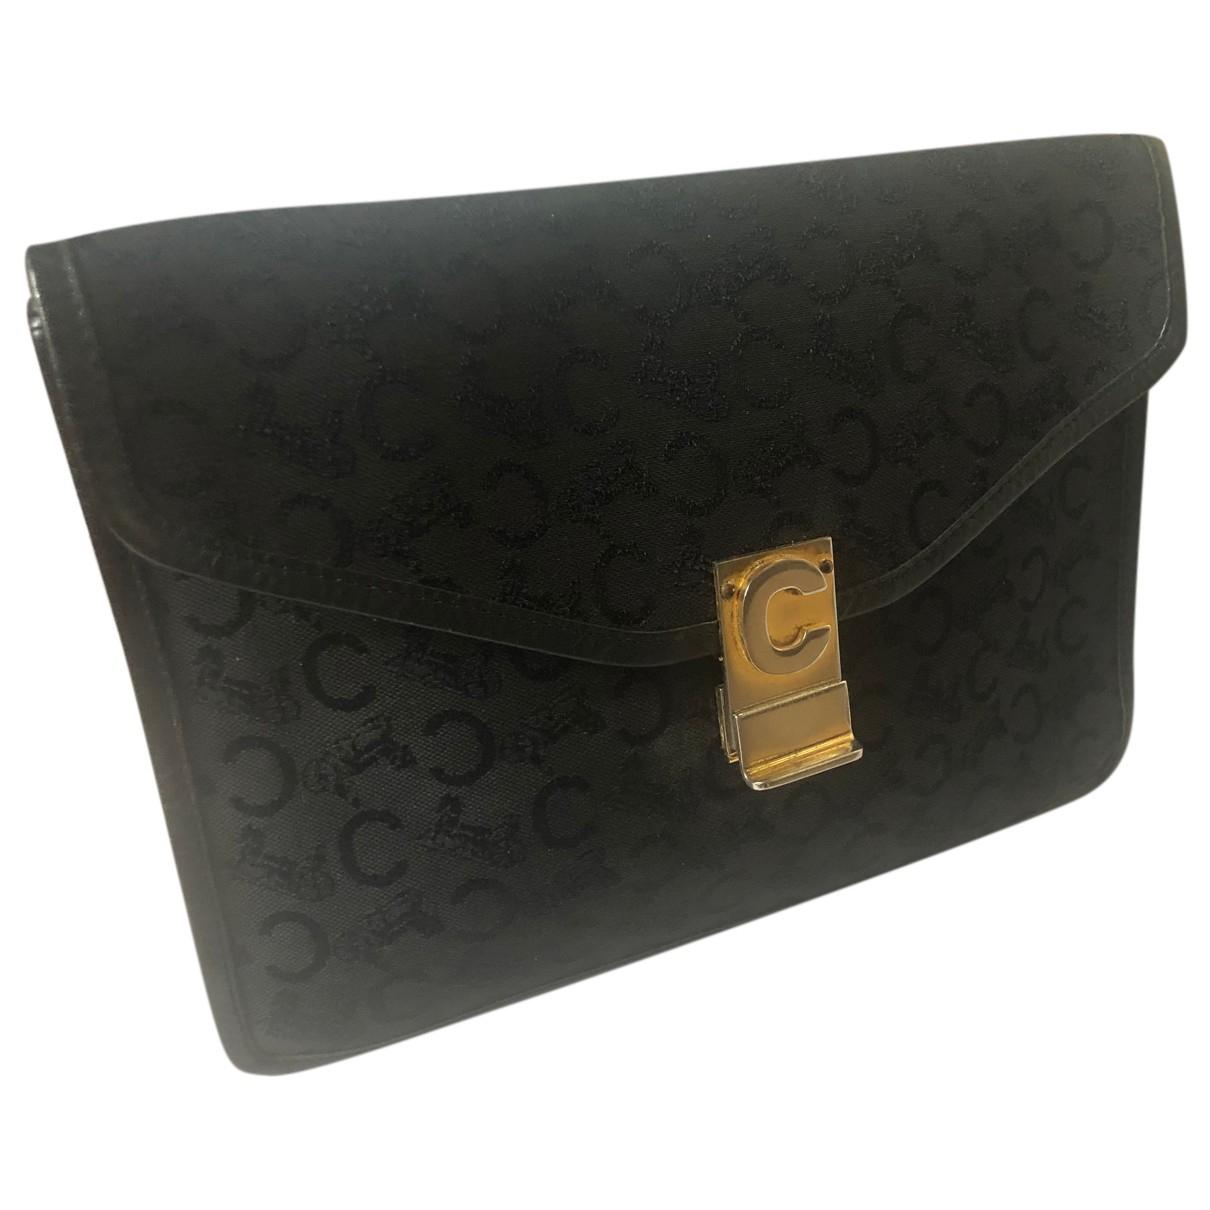 Celine N Black Cloth Clutch bag for Women N